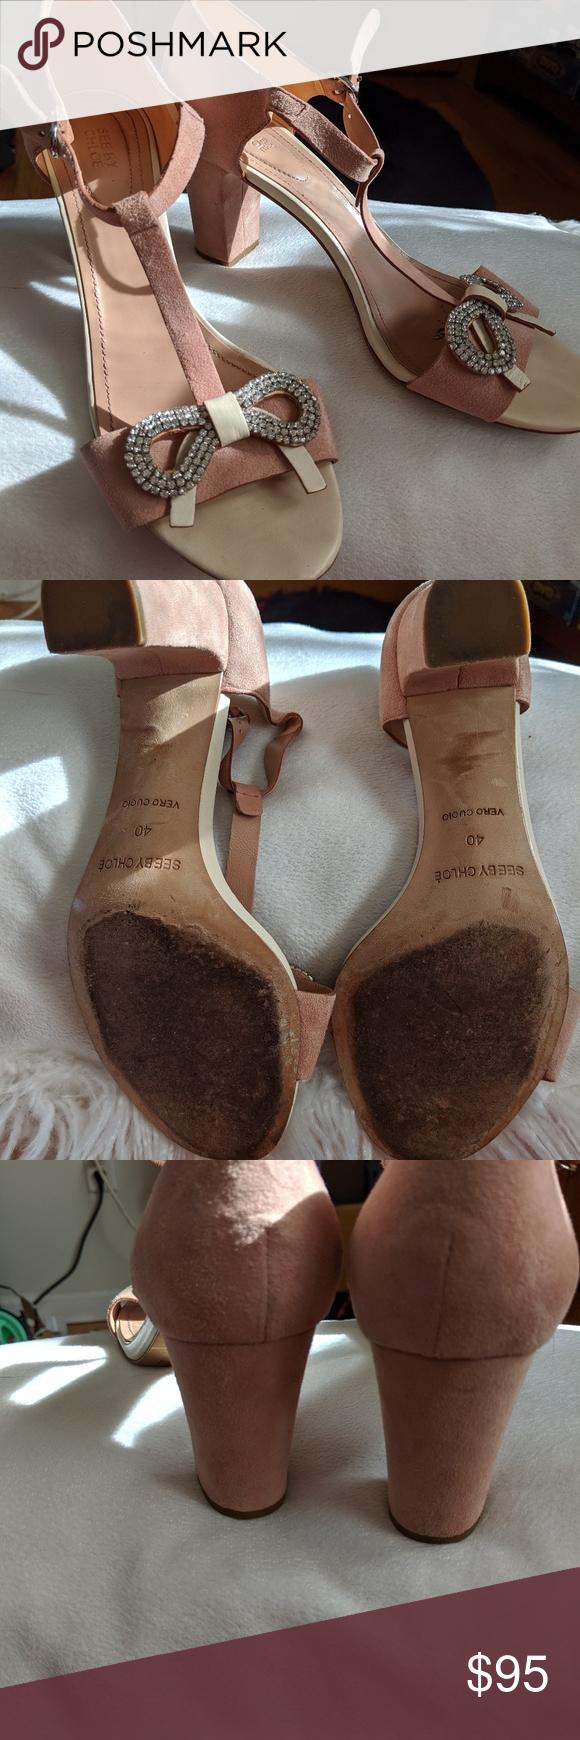 See by Chloe shoes Blush suede block heels w rhinestones See By Chloe Shoes Heels #seebychloe See by Chloe shoes Blush suede block heels w rhinestones See By Chloe Shoes Heels #seebychloe